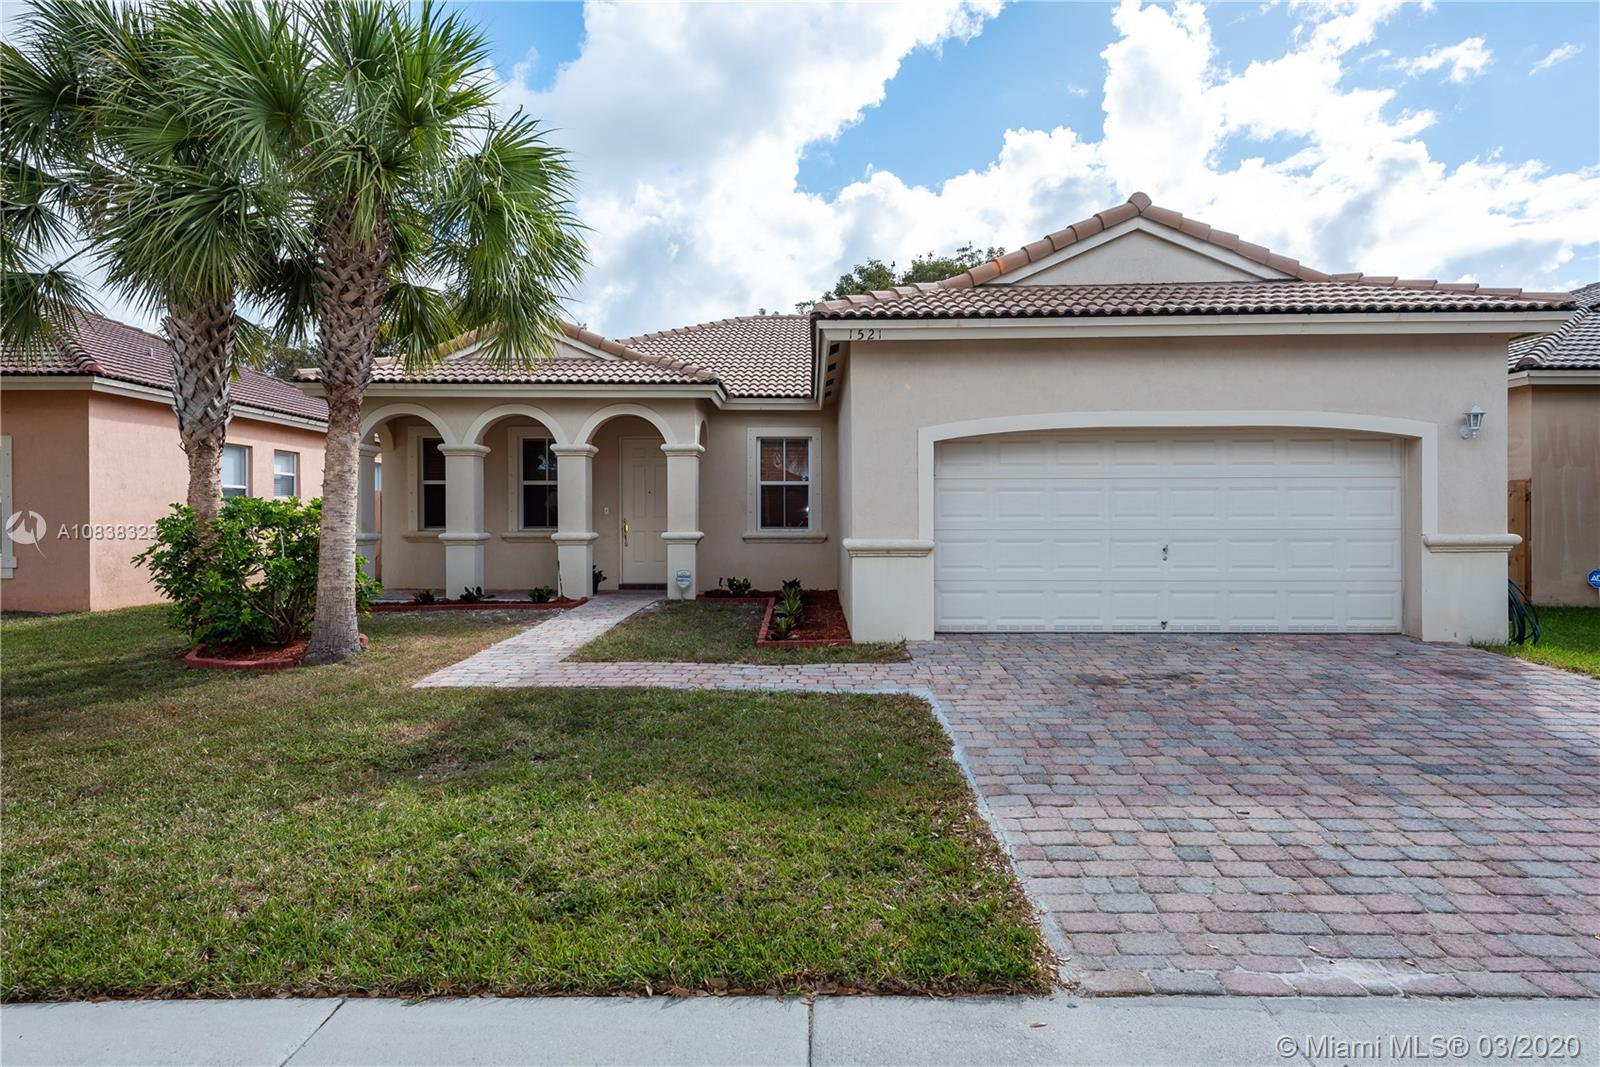 1521 SE 17th Ave, Homestead, FL 33035 - Homestead, FL real estate listing